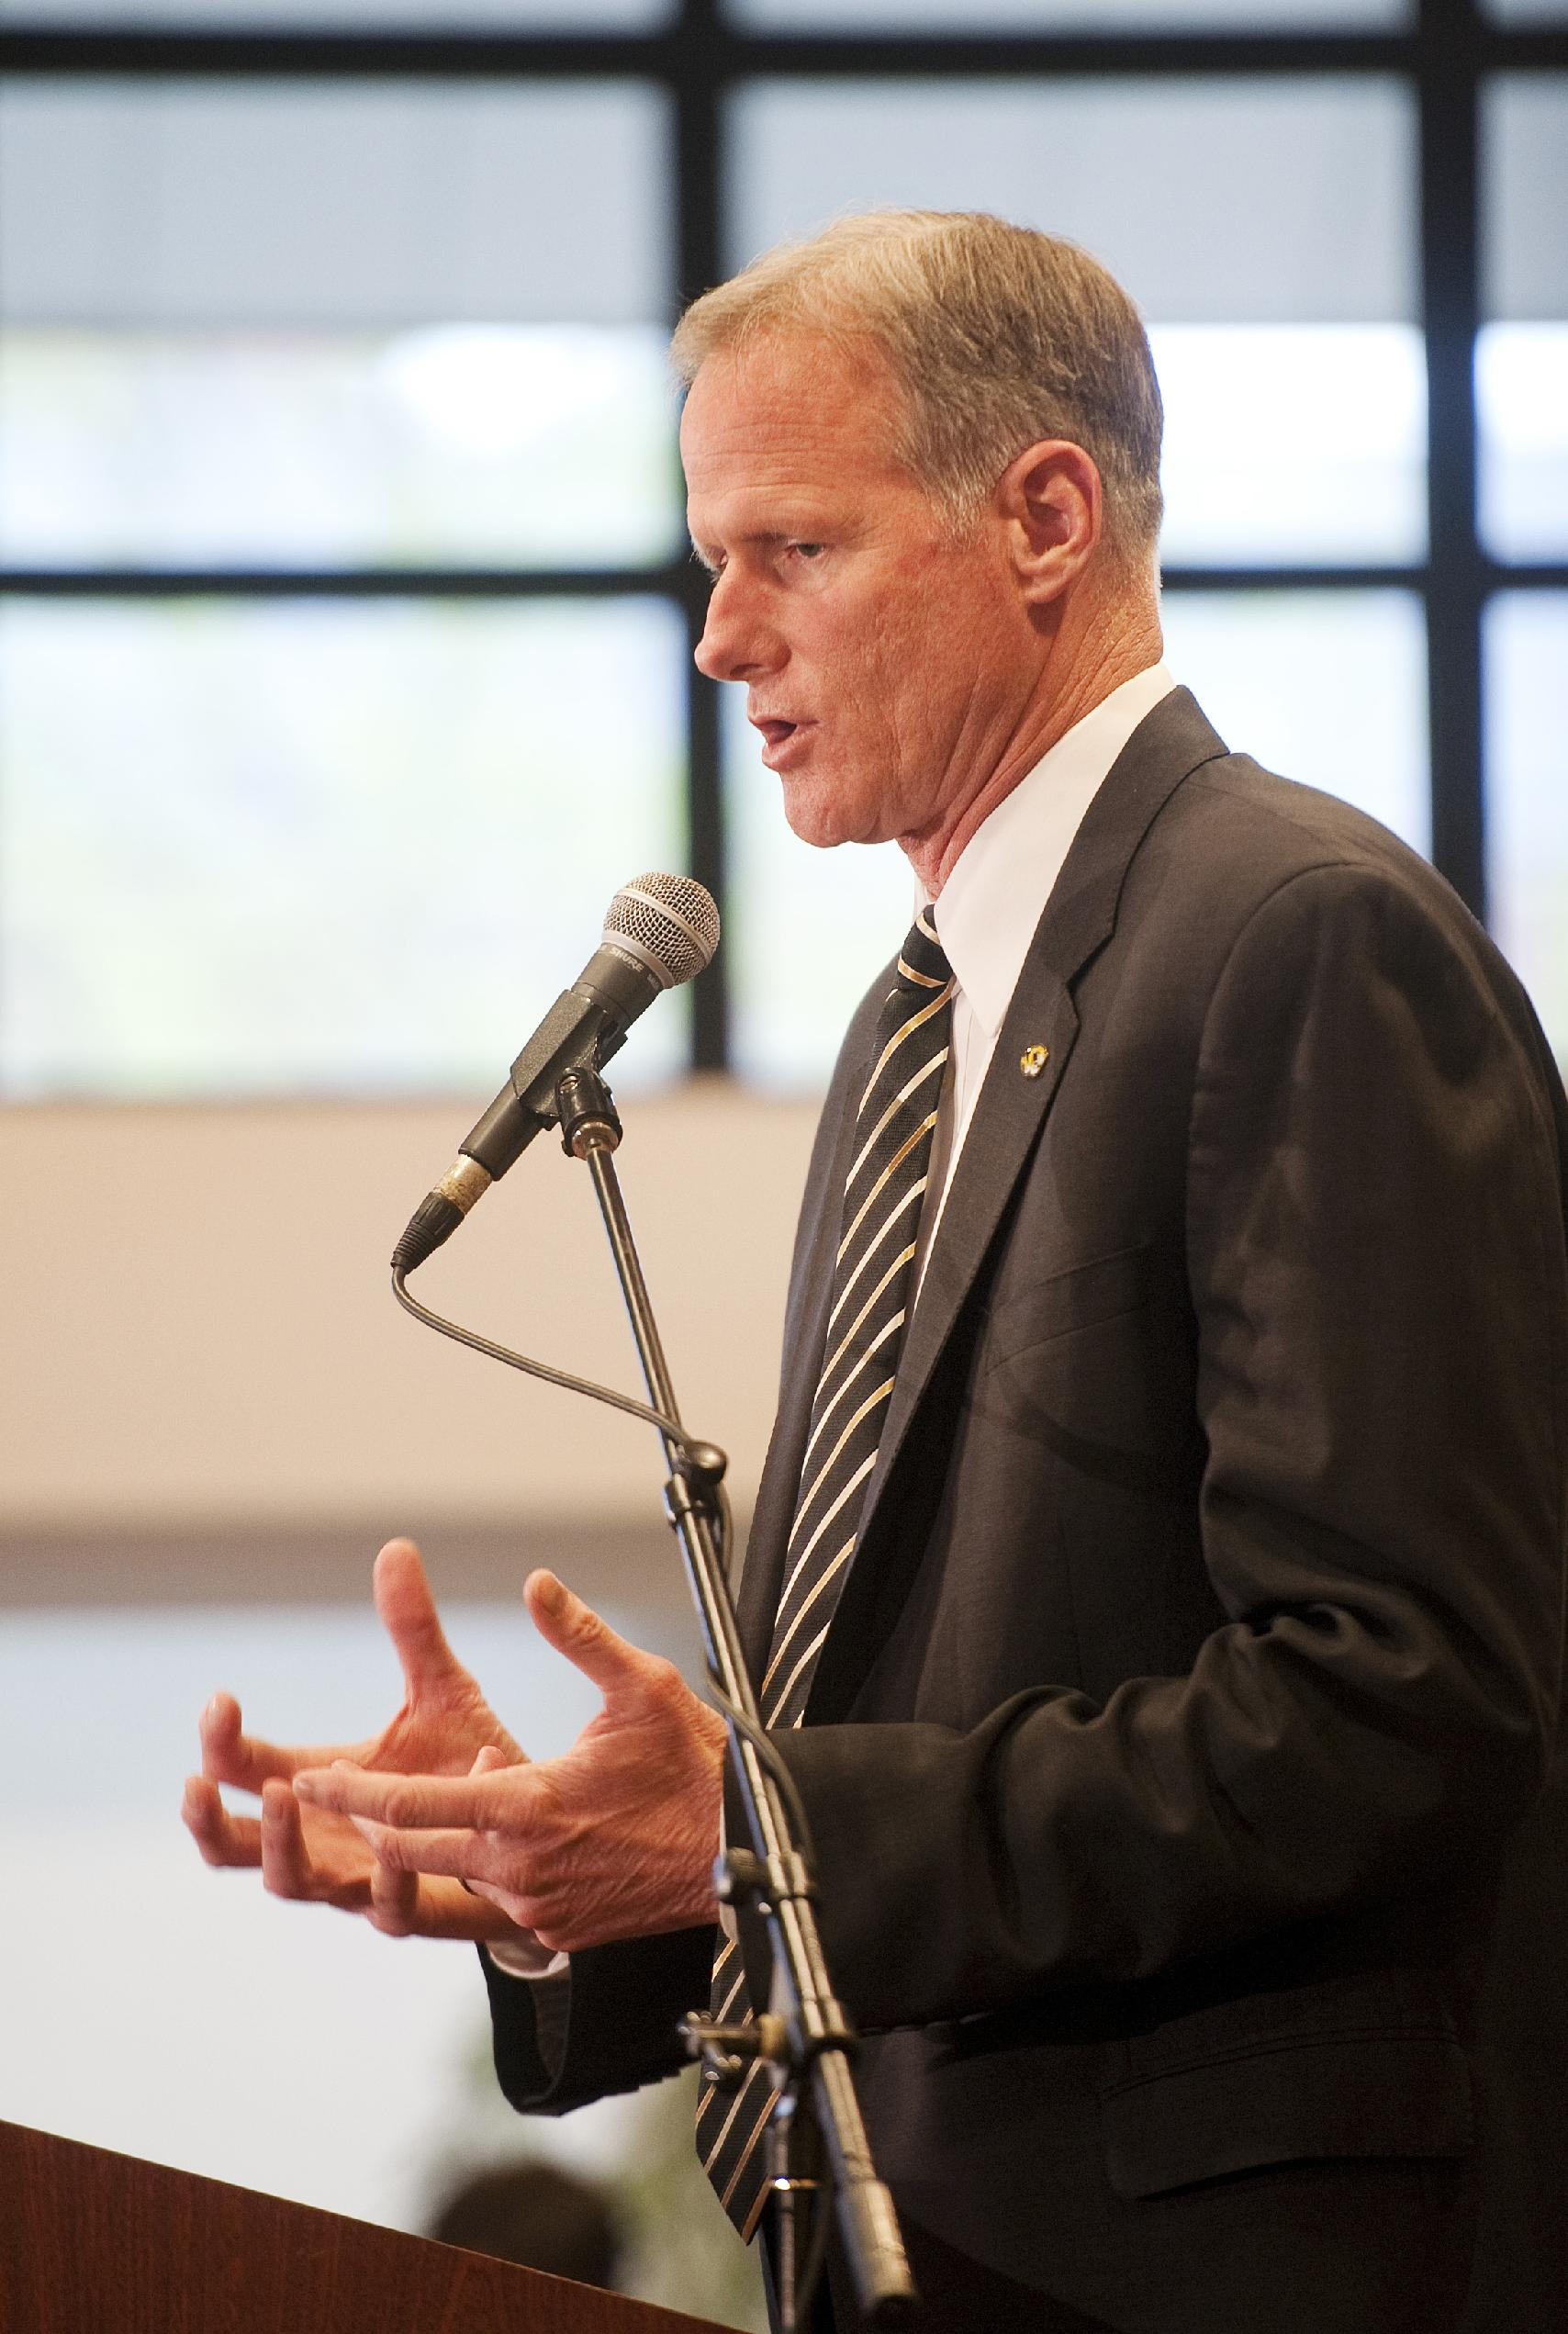 New Missouri coach gets 'dream job'